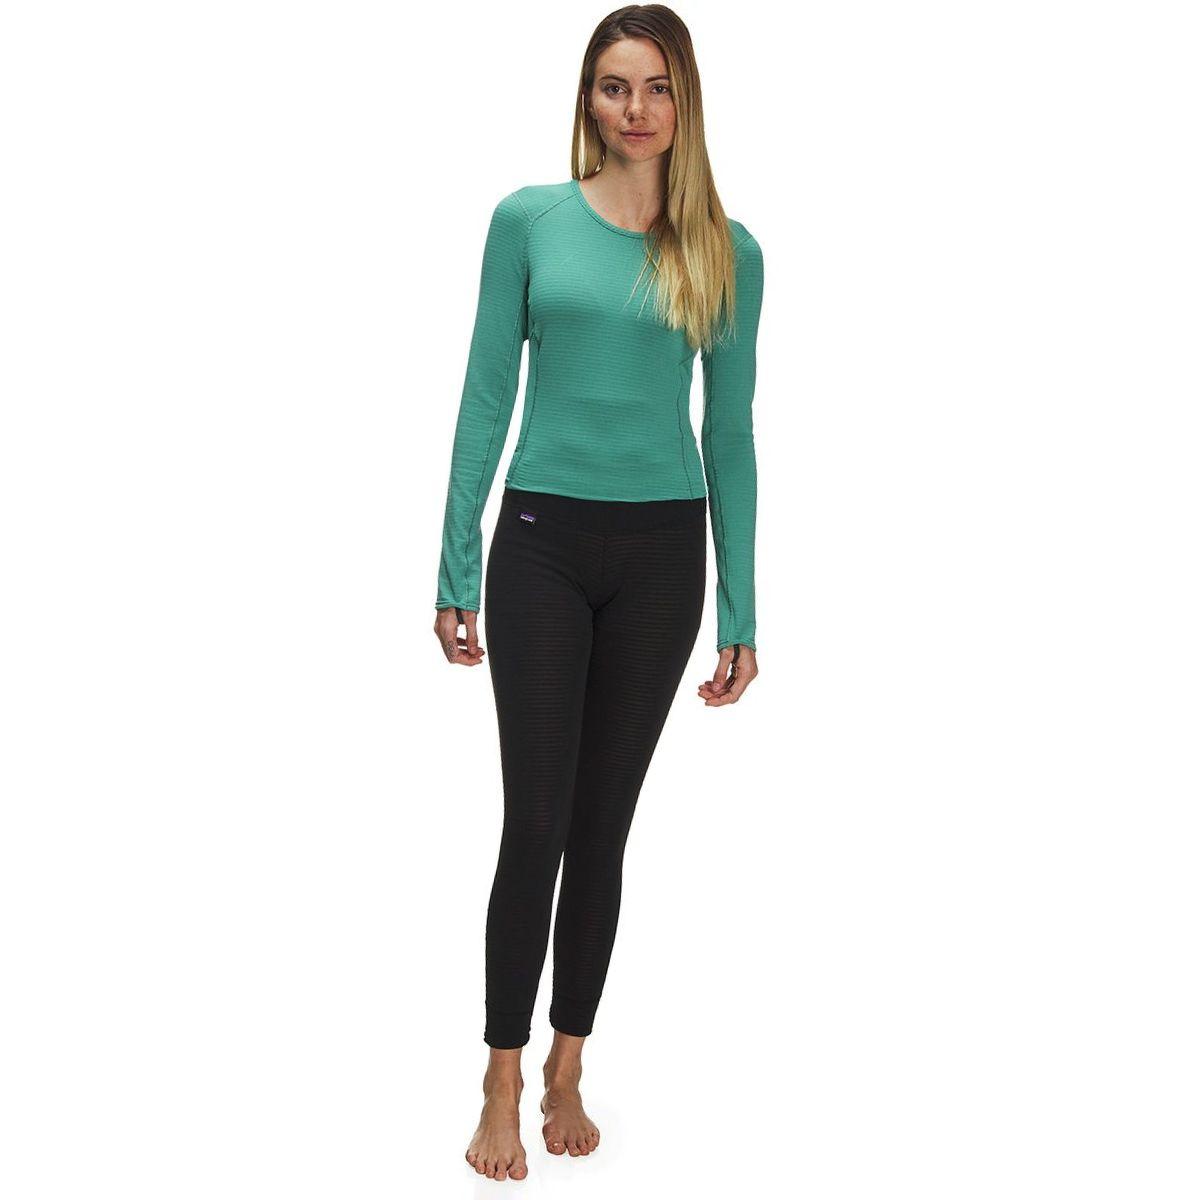 Patagonia Capilene Thermal Weight Bottom - Women's